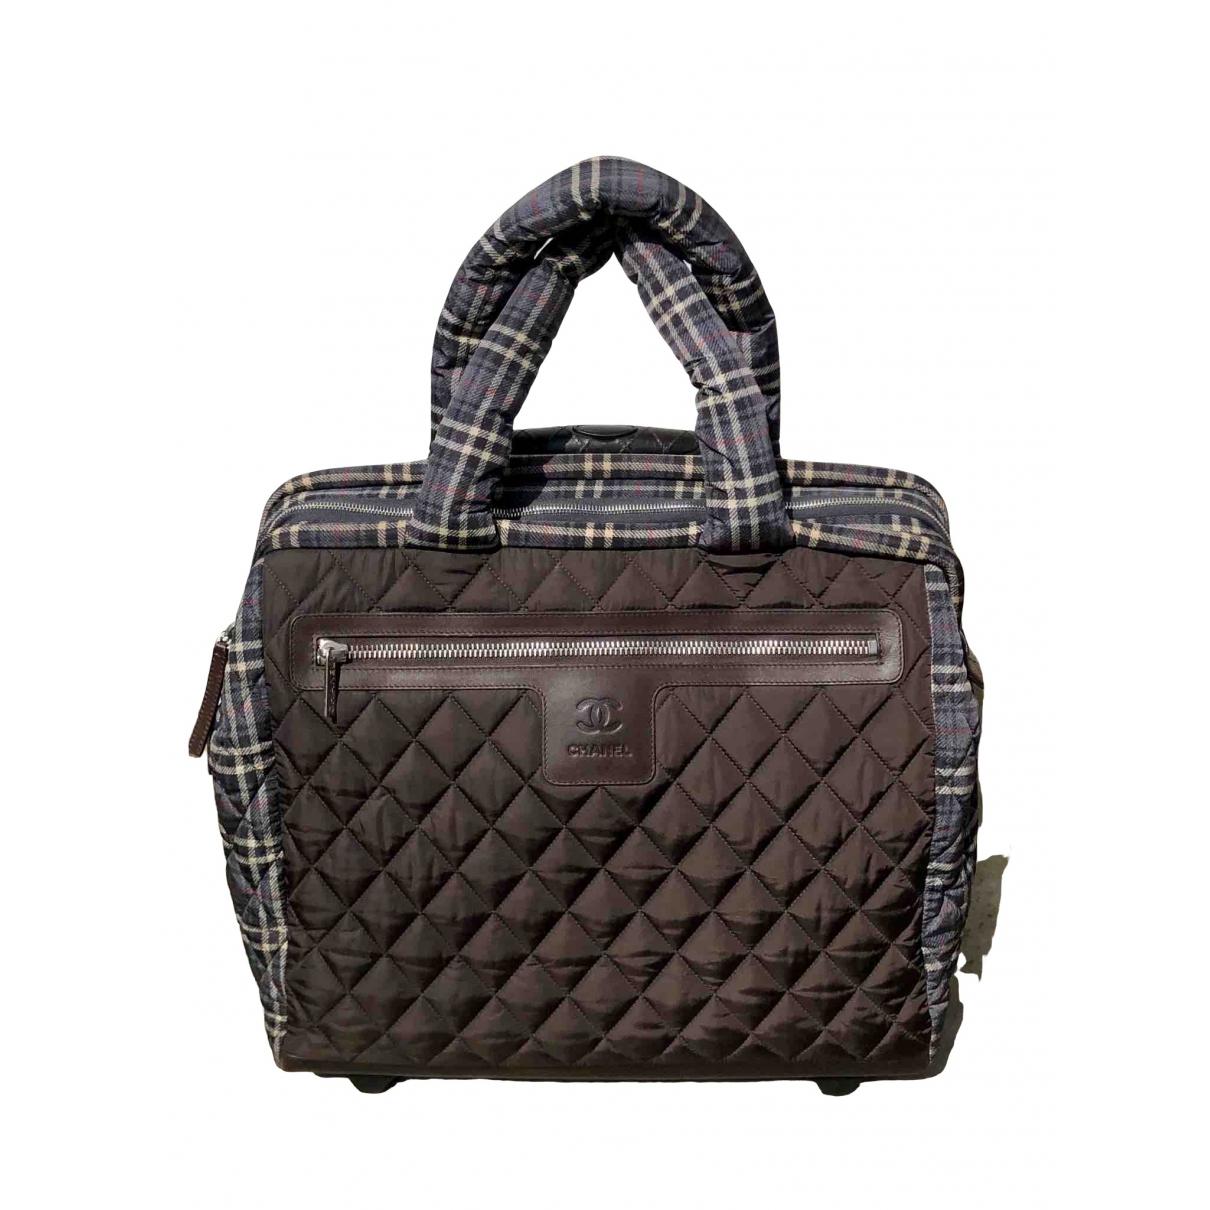 Chanel \N Brown Cloth Travel bag for Women \N